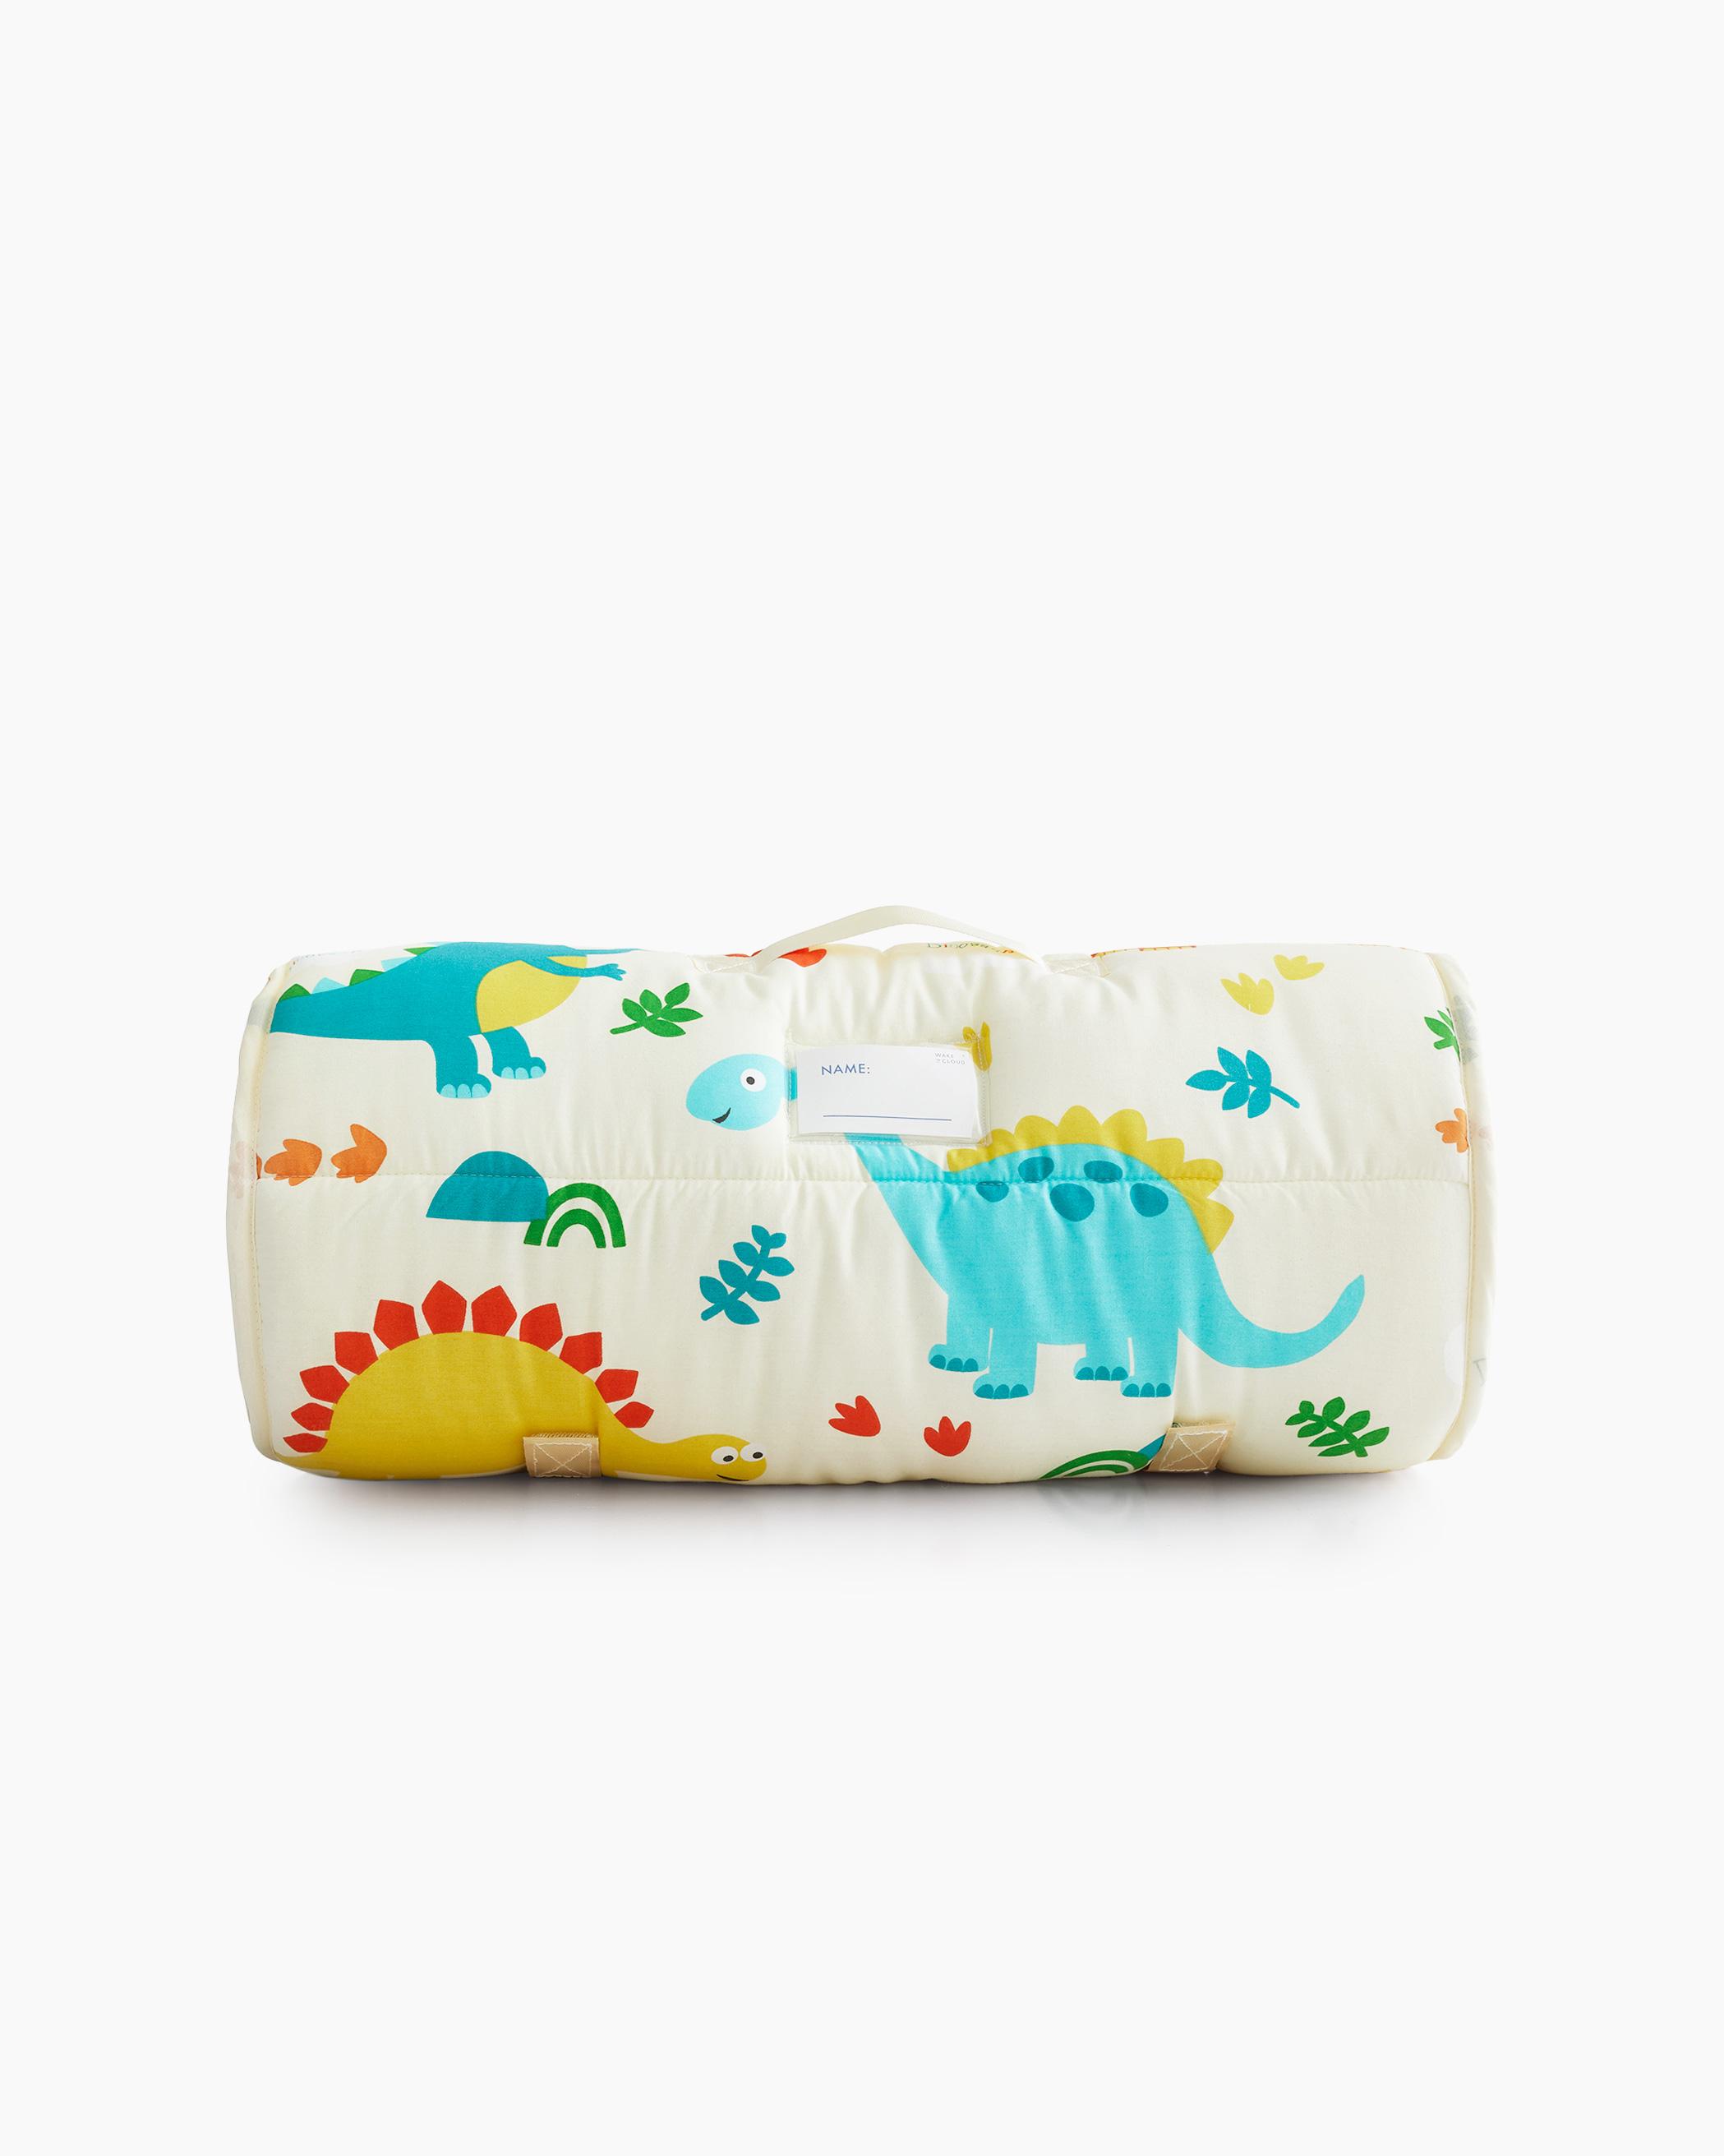 Ivory Cream Dinosaurs Cotton Kids Nap Mat